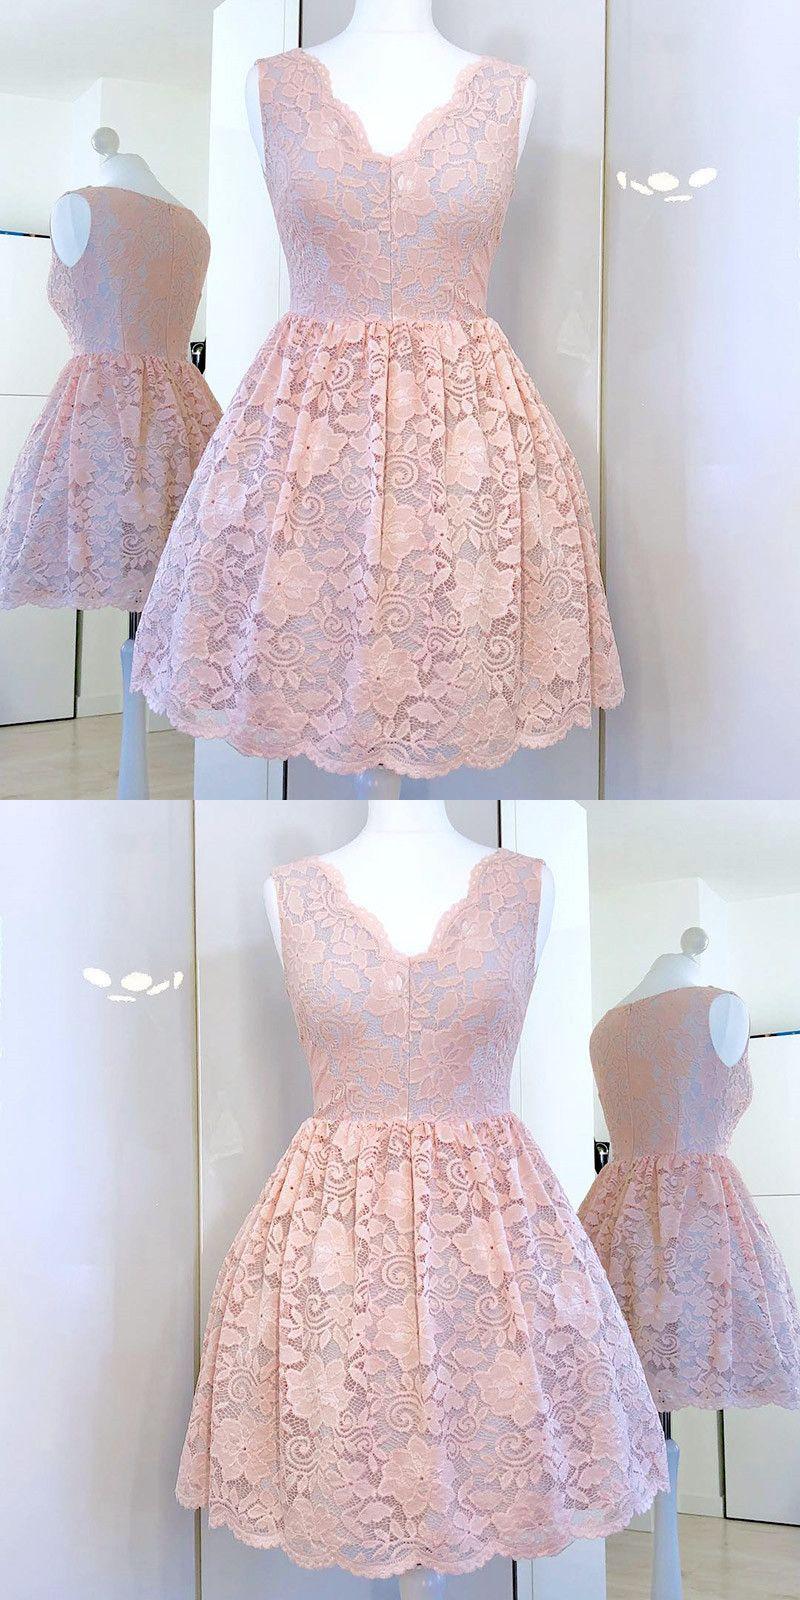 Aline vneck pink lace short homecoming dress vestiditos